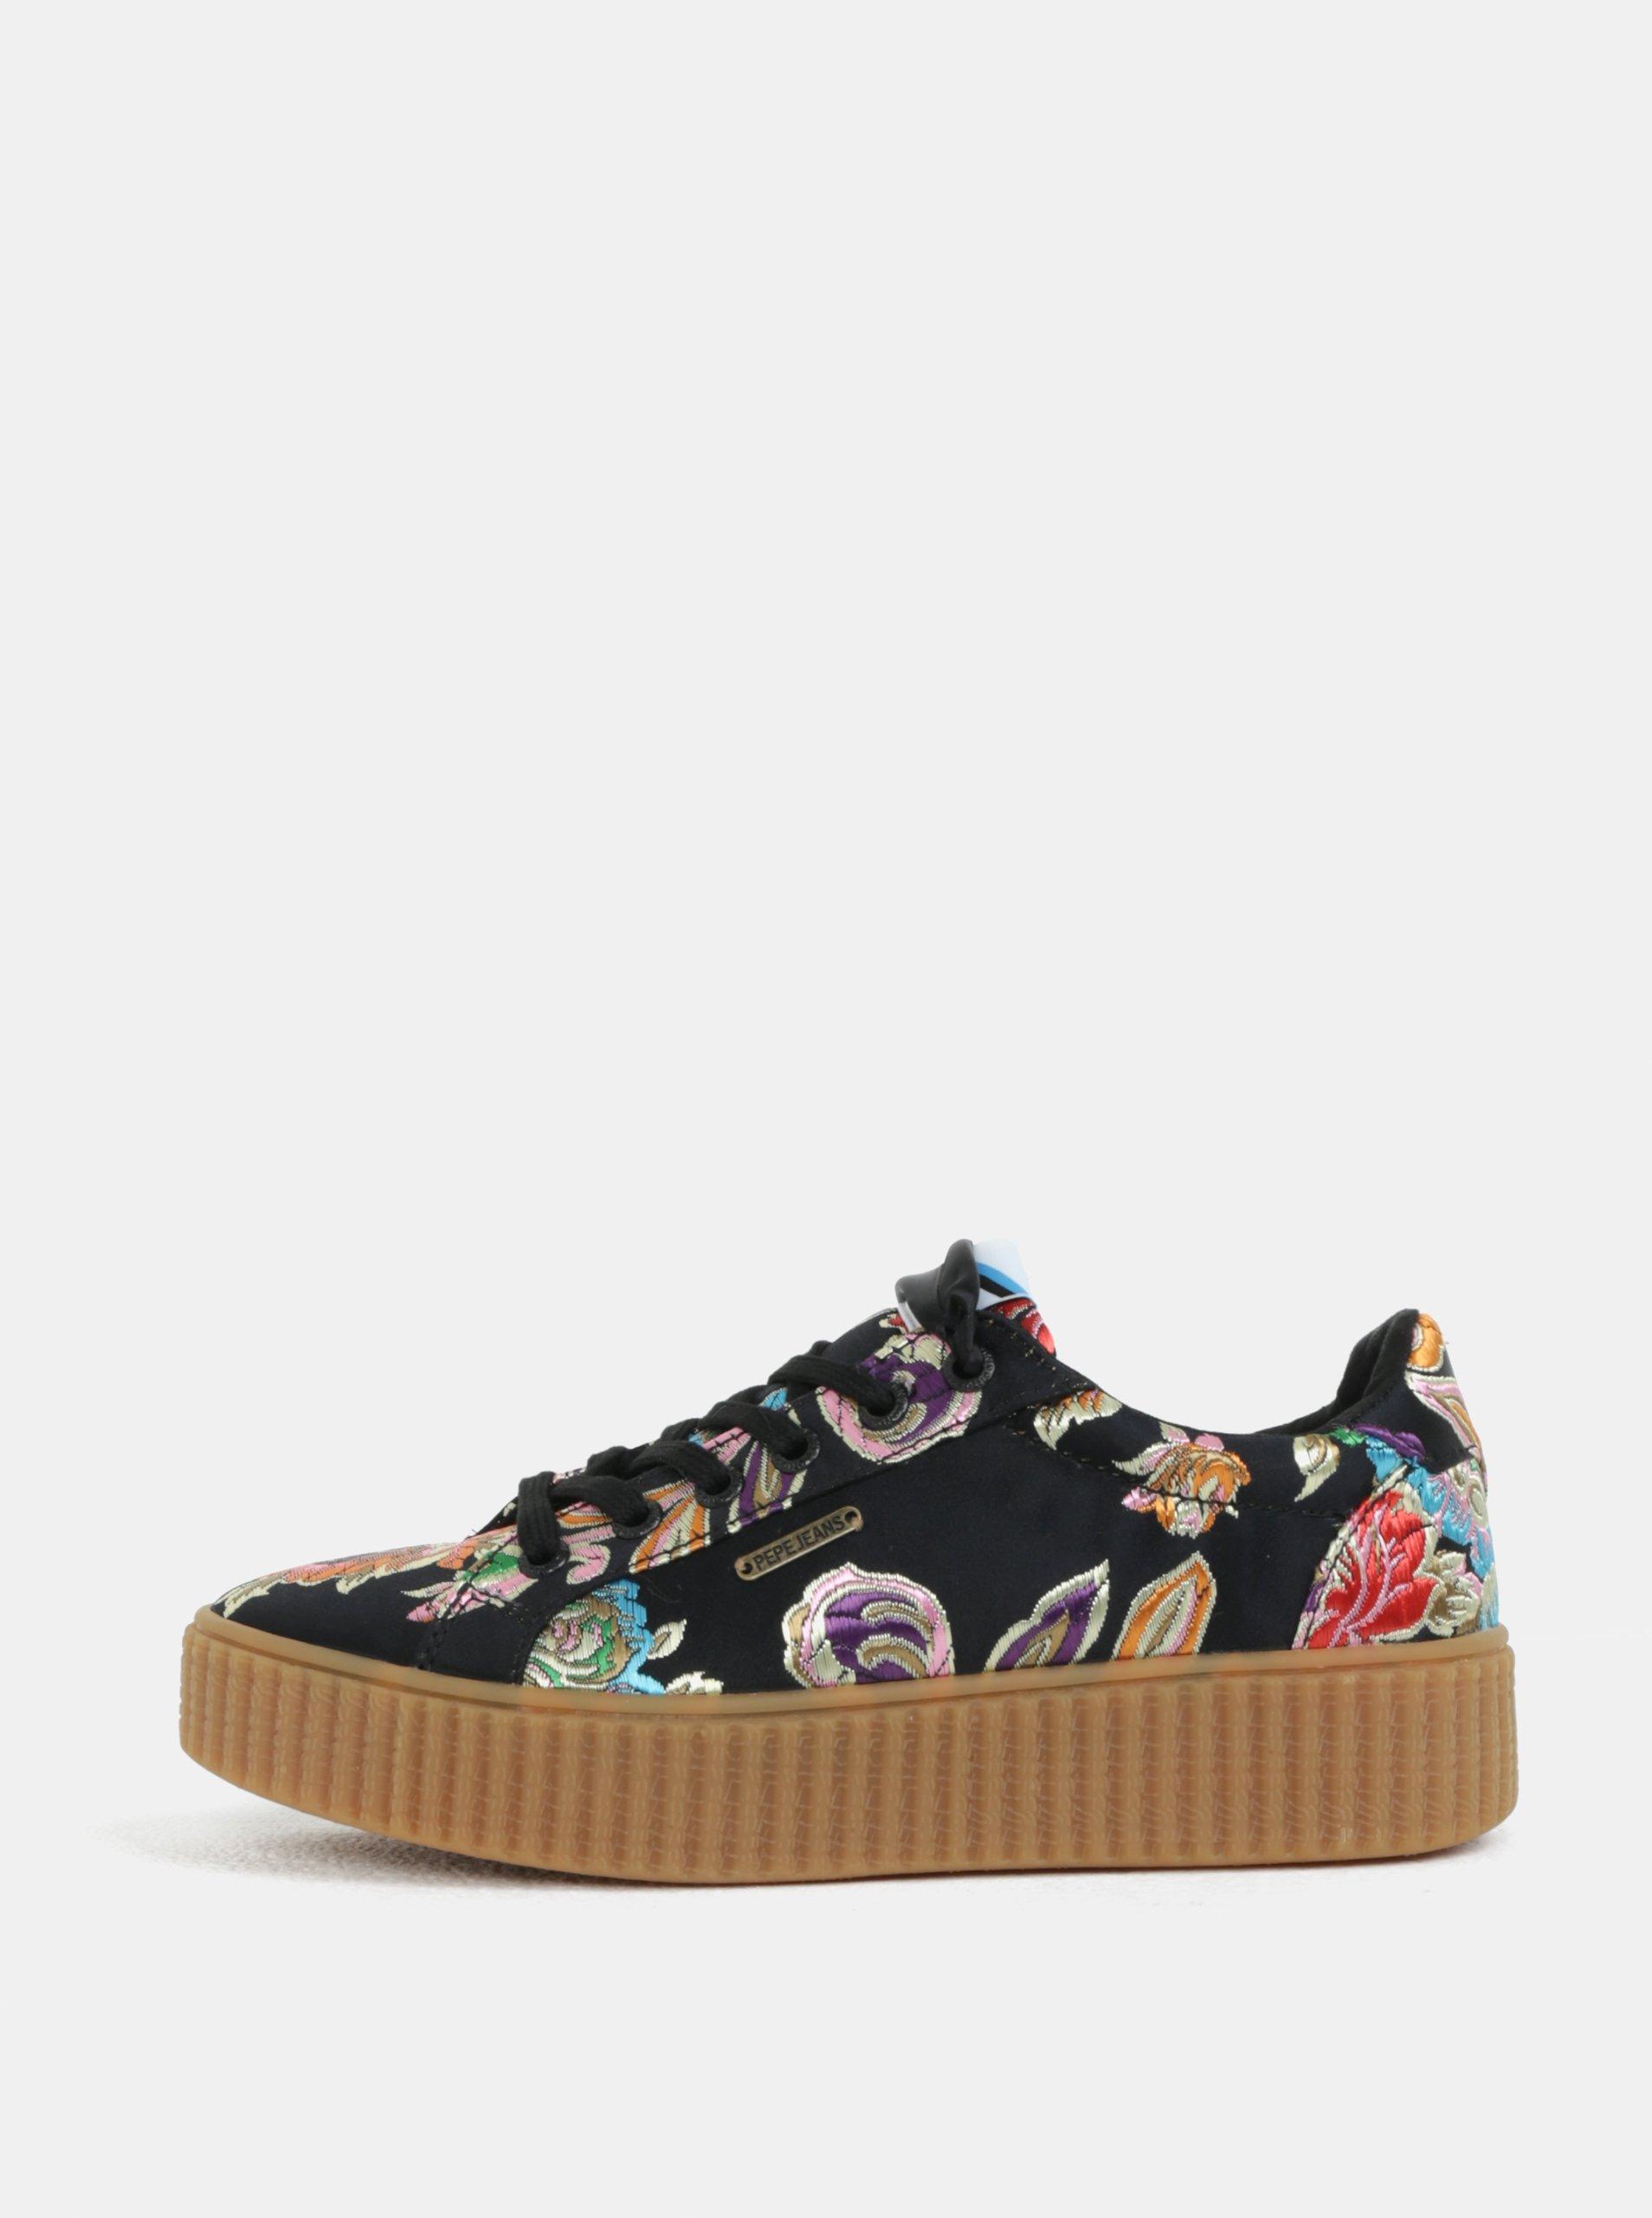 e670a8451b2d Čierne dámske kvetované tenisky na platforme Pepe Jeans Frida orient ...